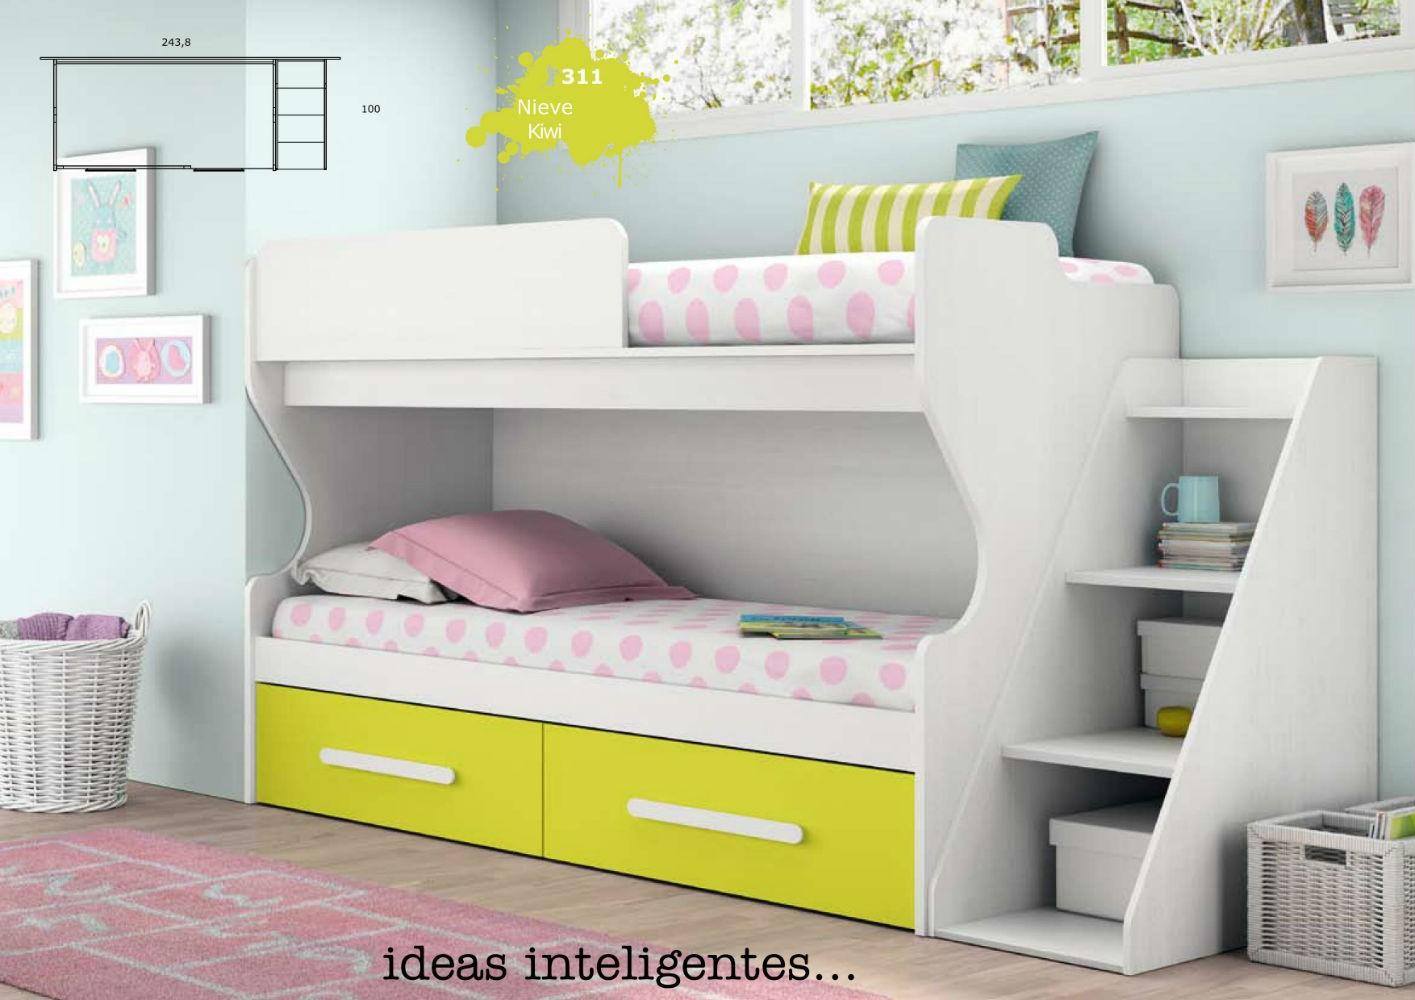 Litera mueble dormitorio infantil juvenil completo moderno for Muebles dormitorio infantil juvenil